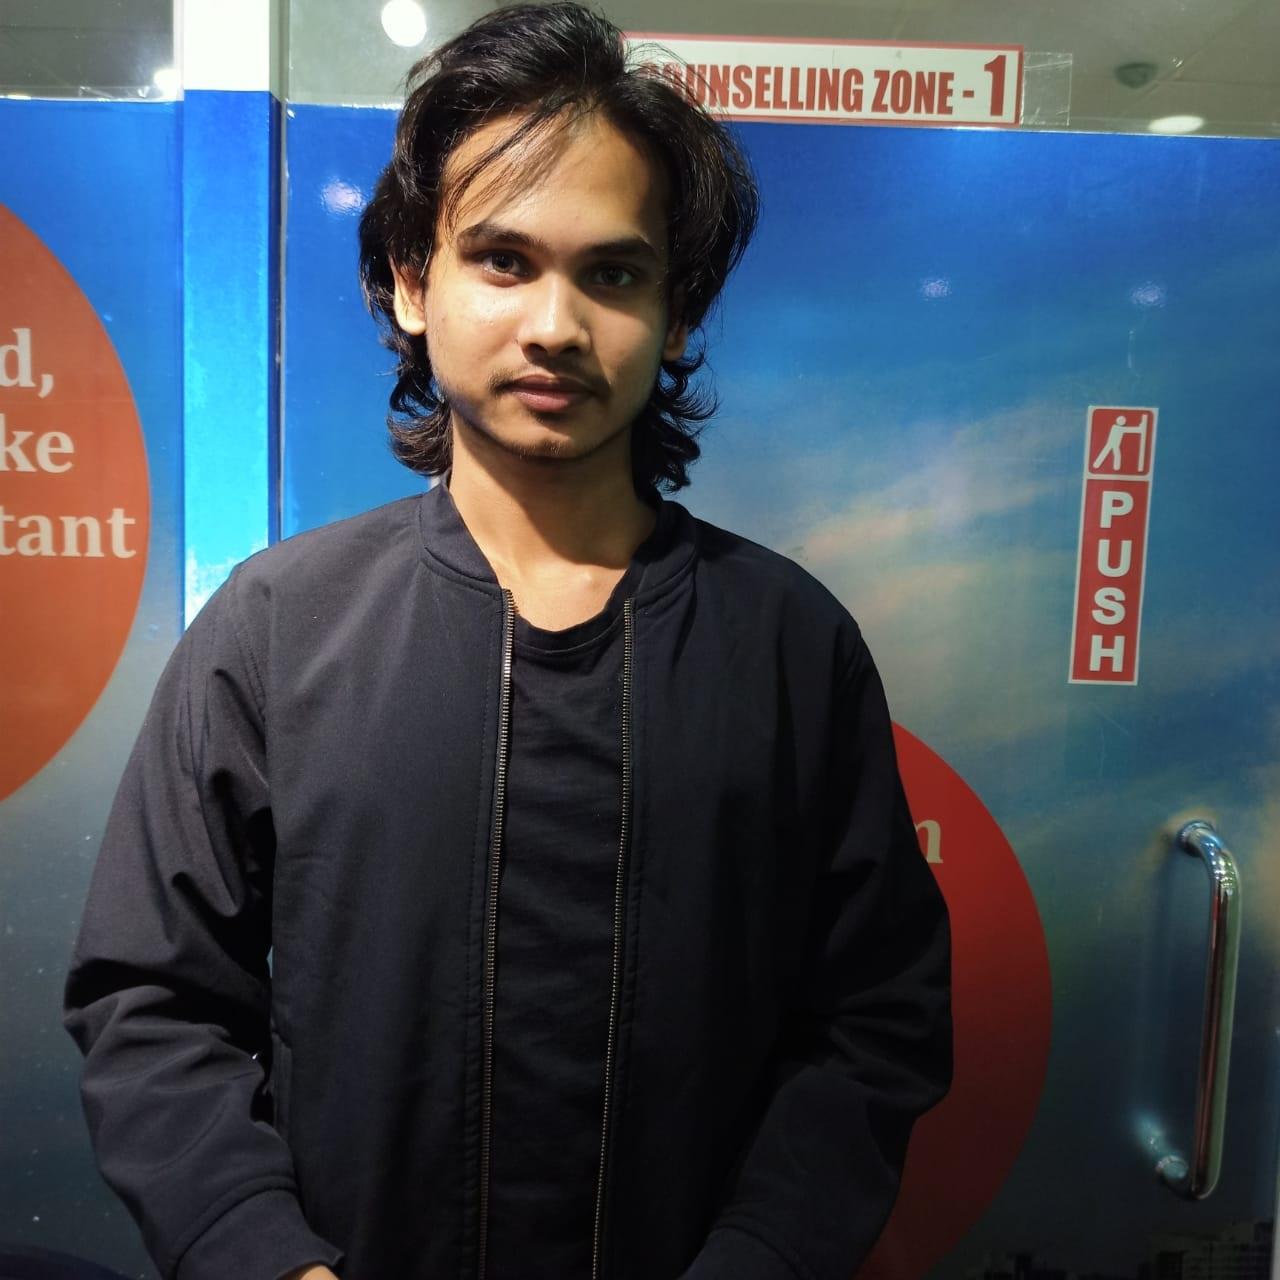 Raiyan Ahmed Chowdhury